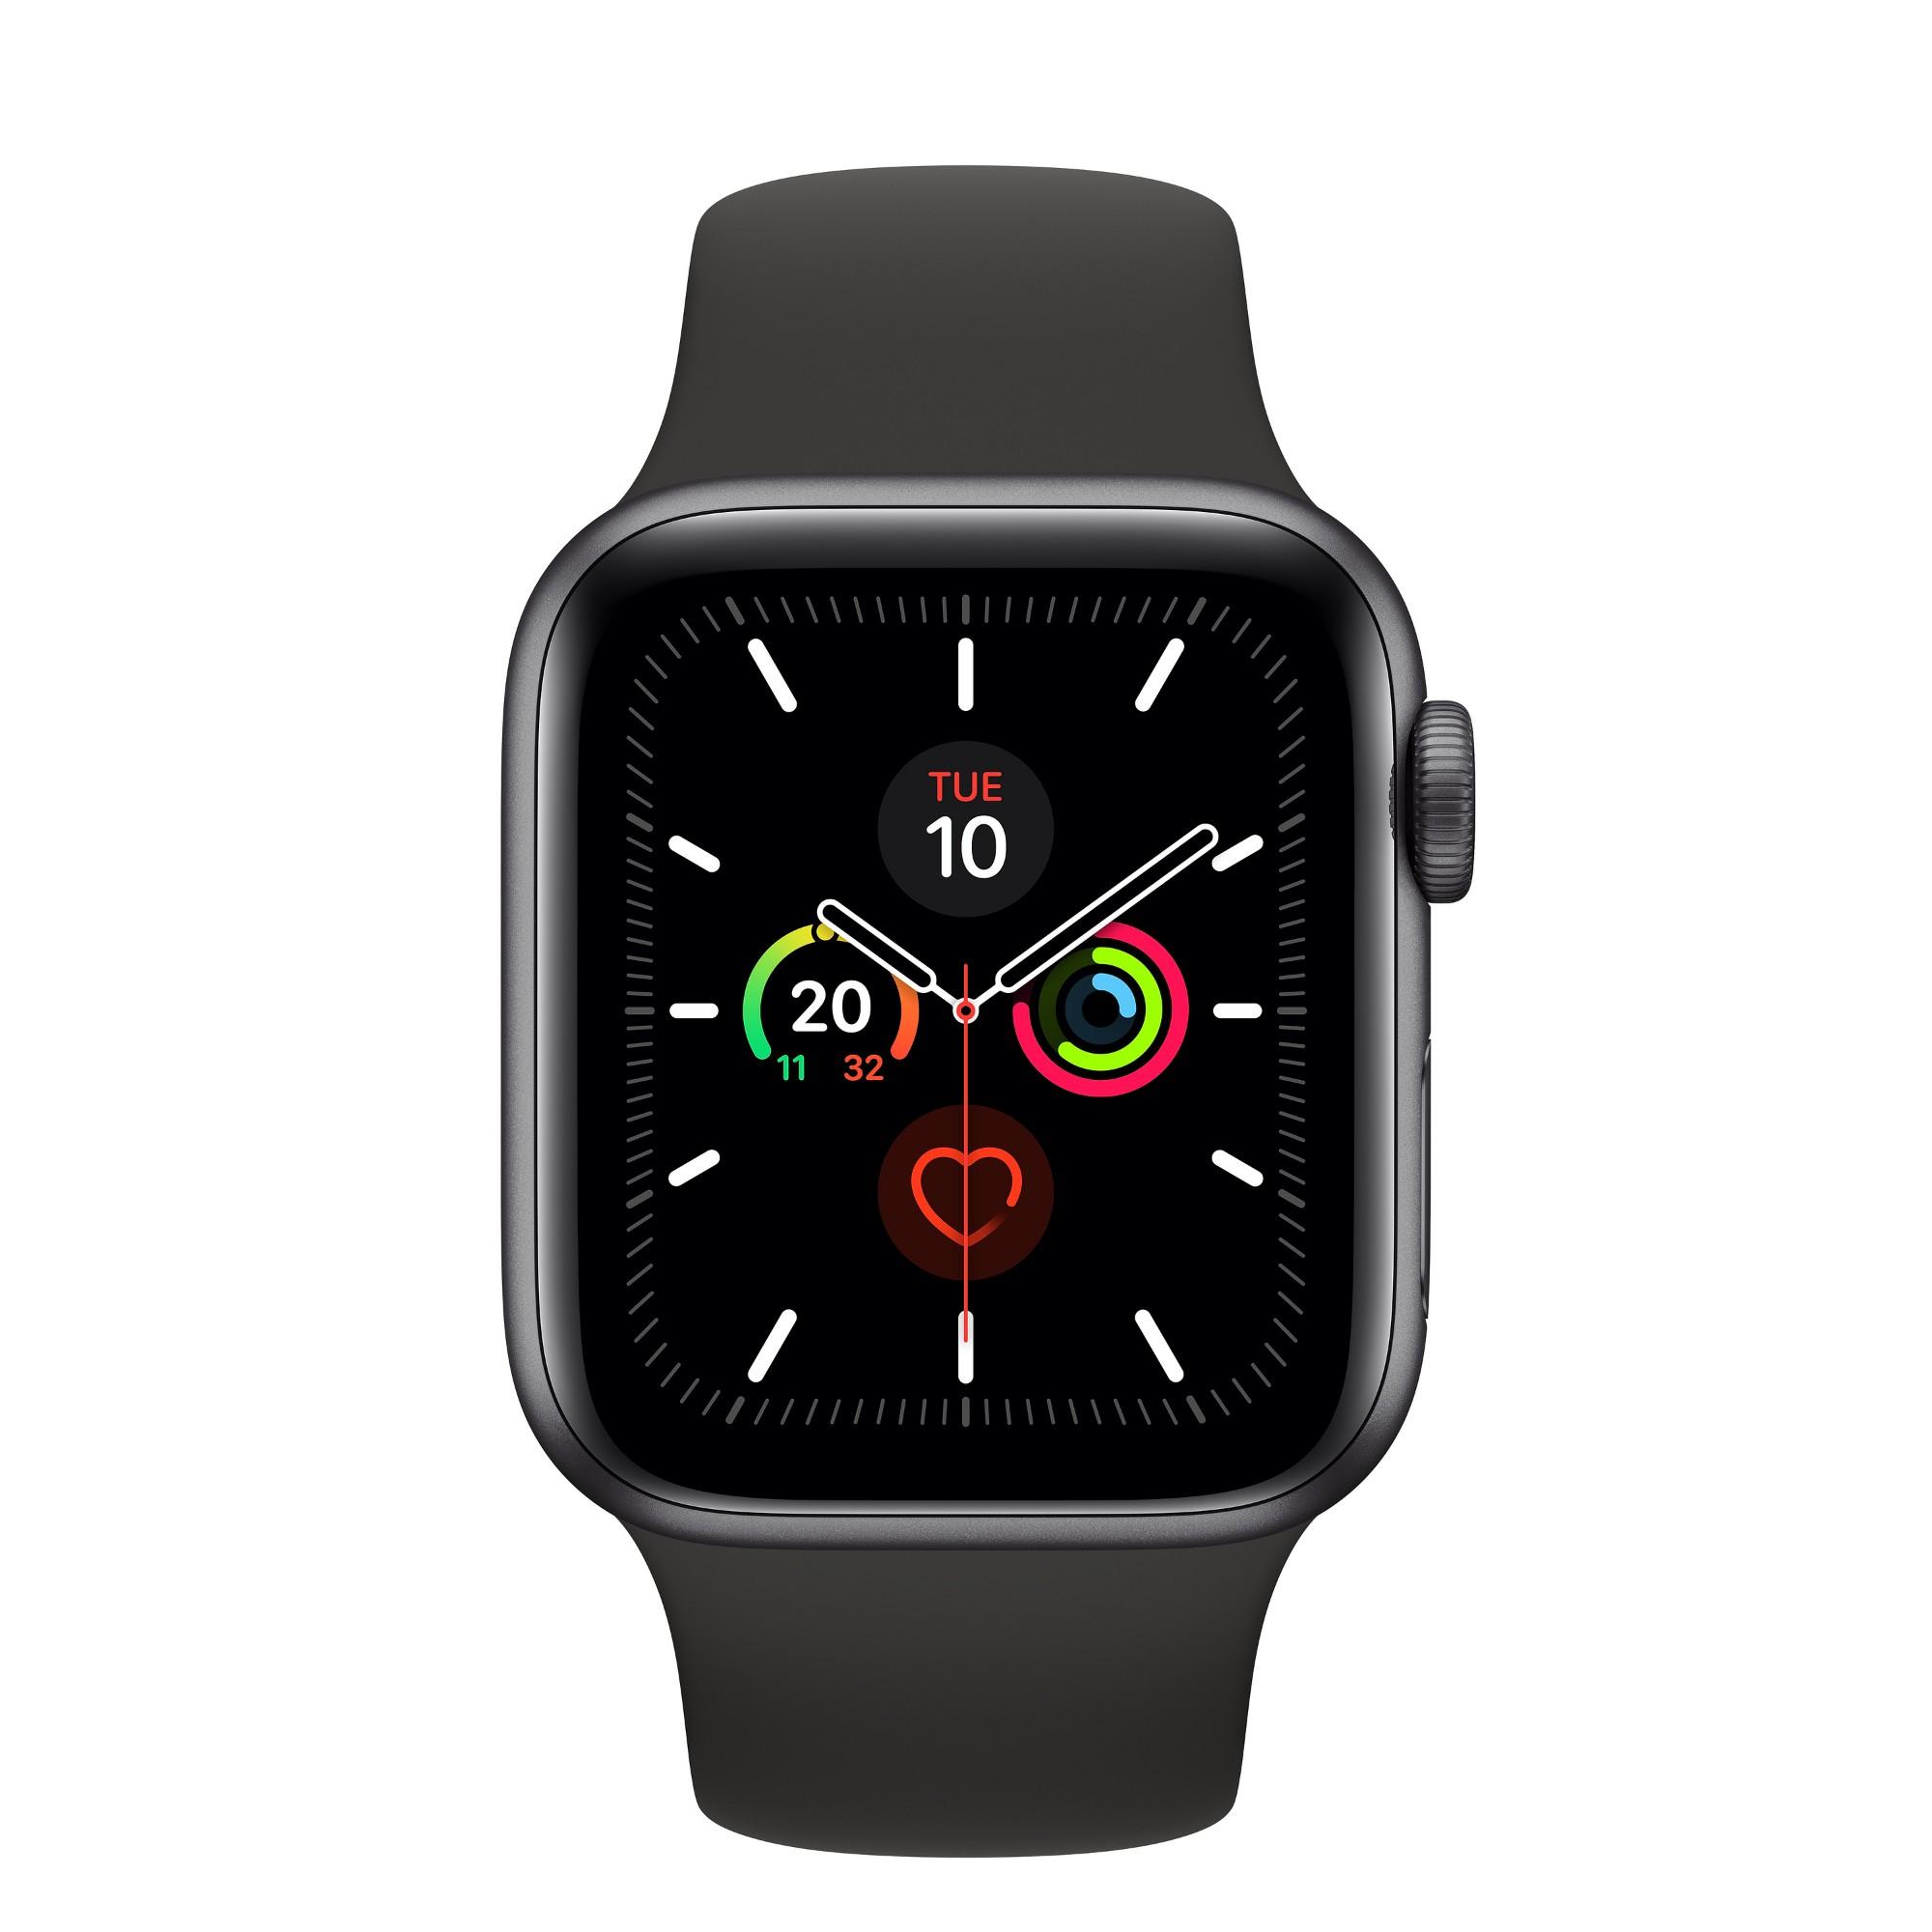 Apple Watch Series 5 smartwatch Grey OLED GPS satellite